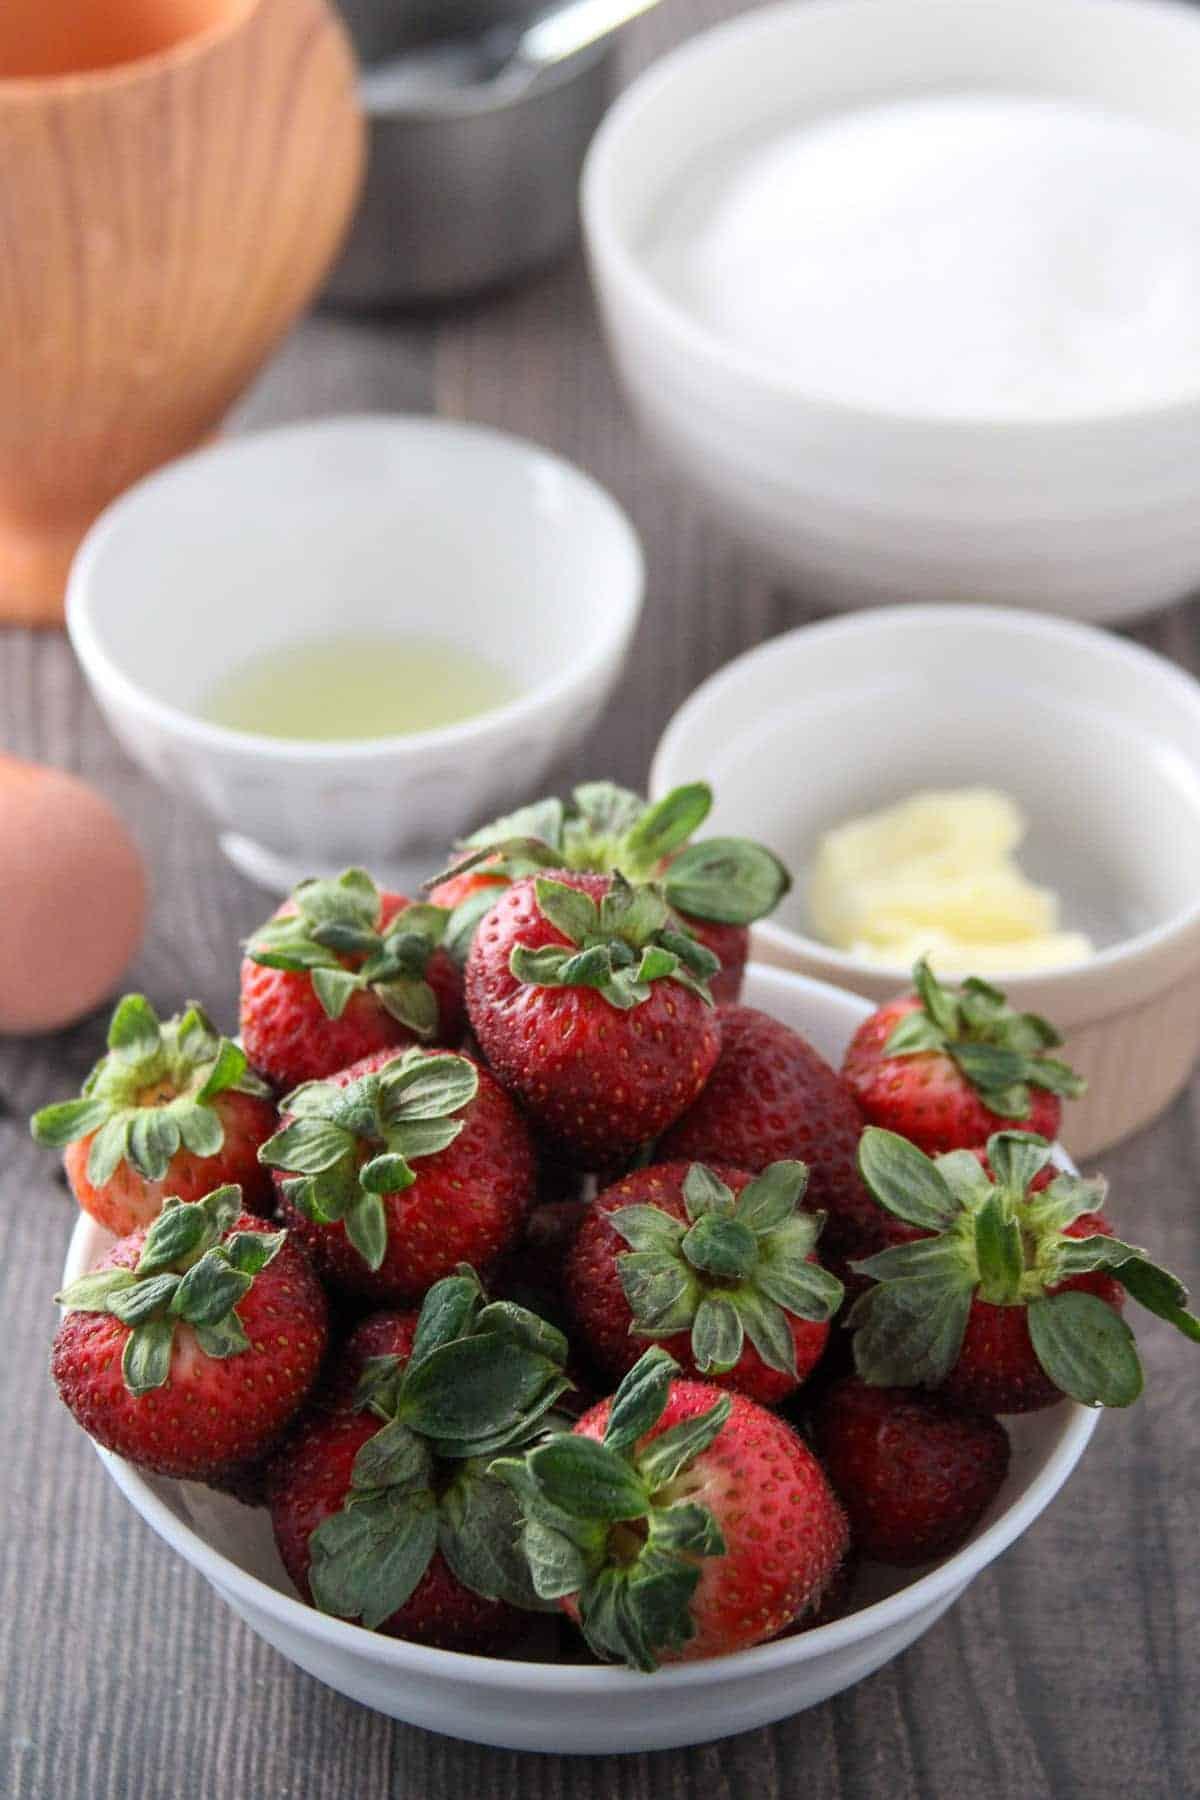 strawberries, sugar, lemon juice, and butter in individual bowls